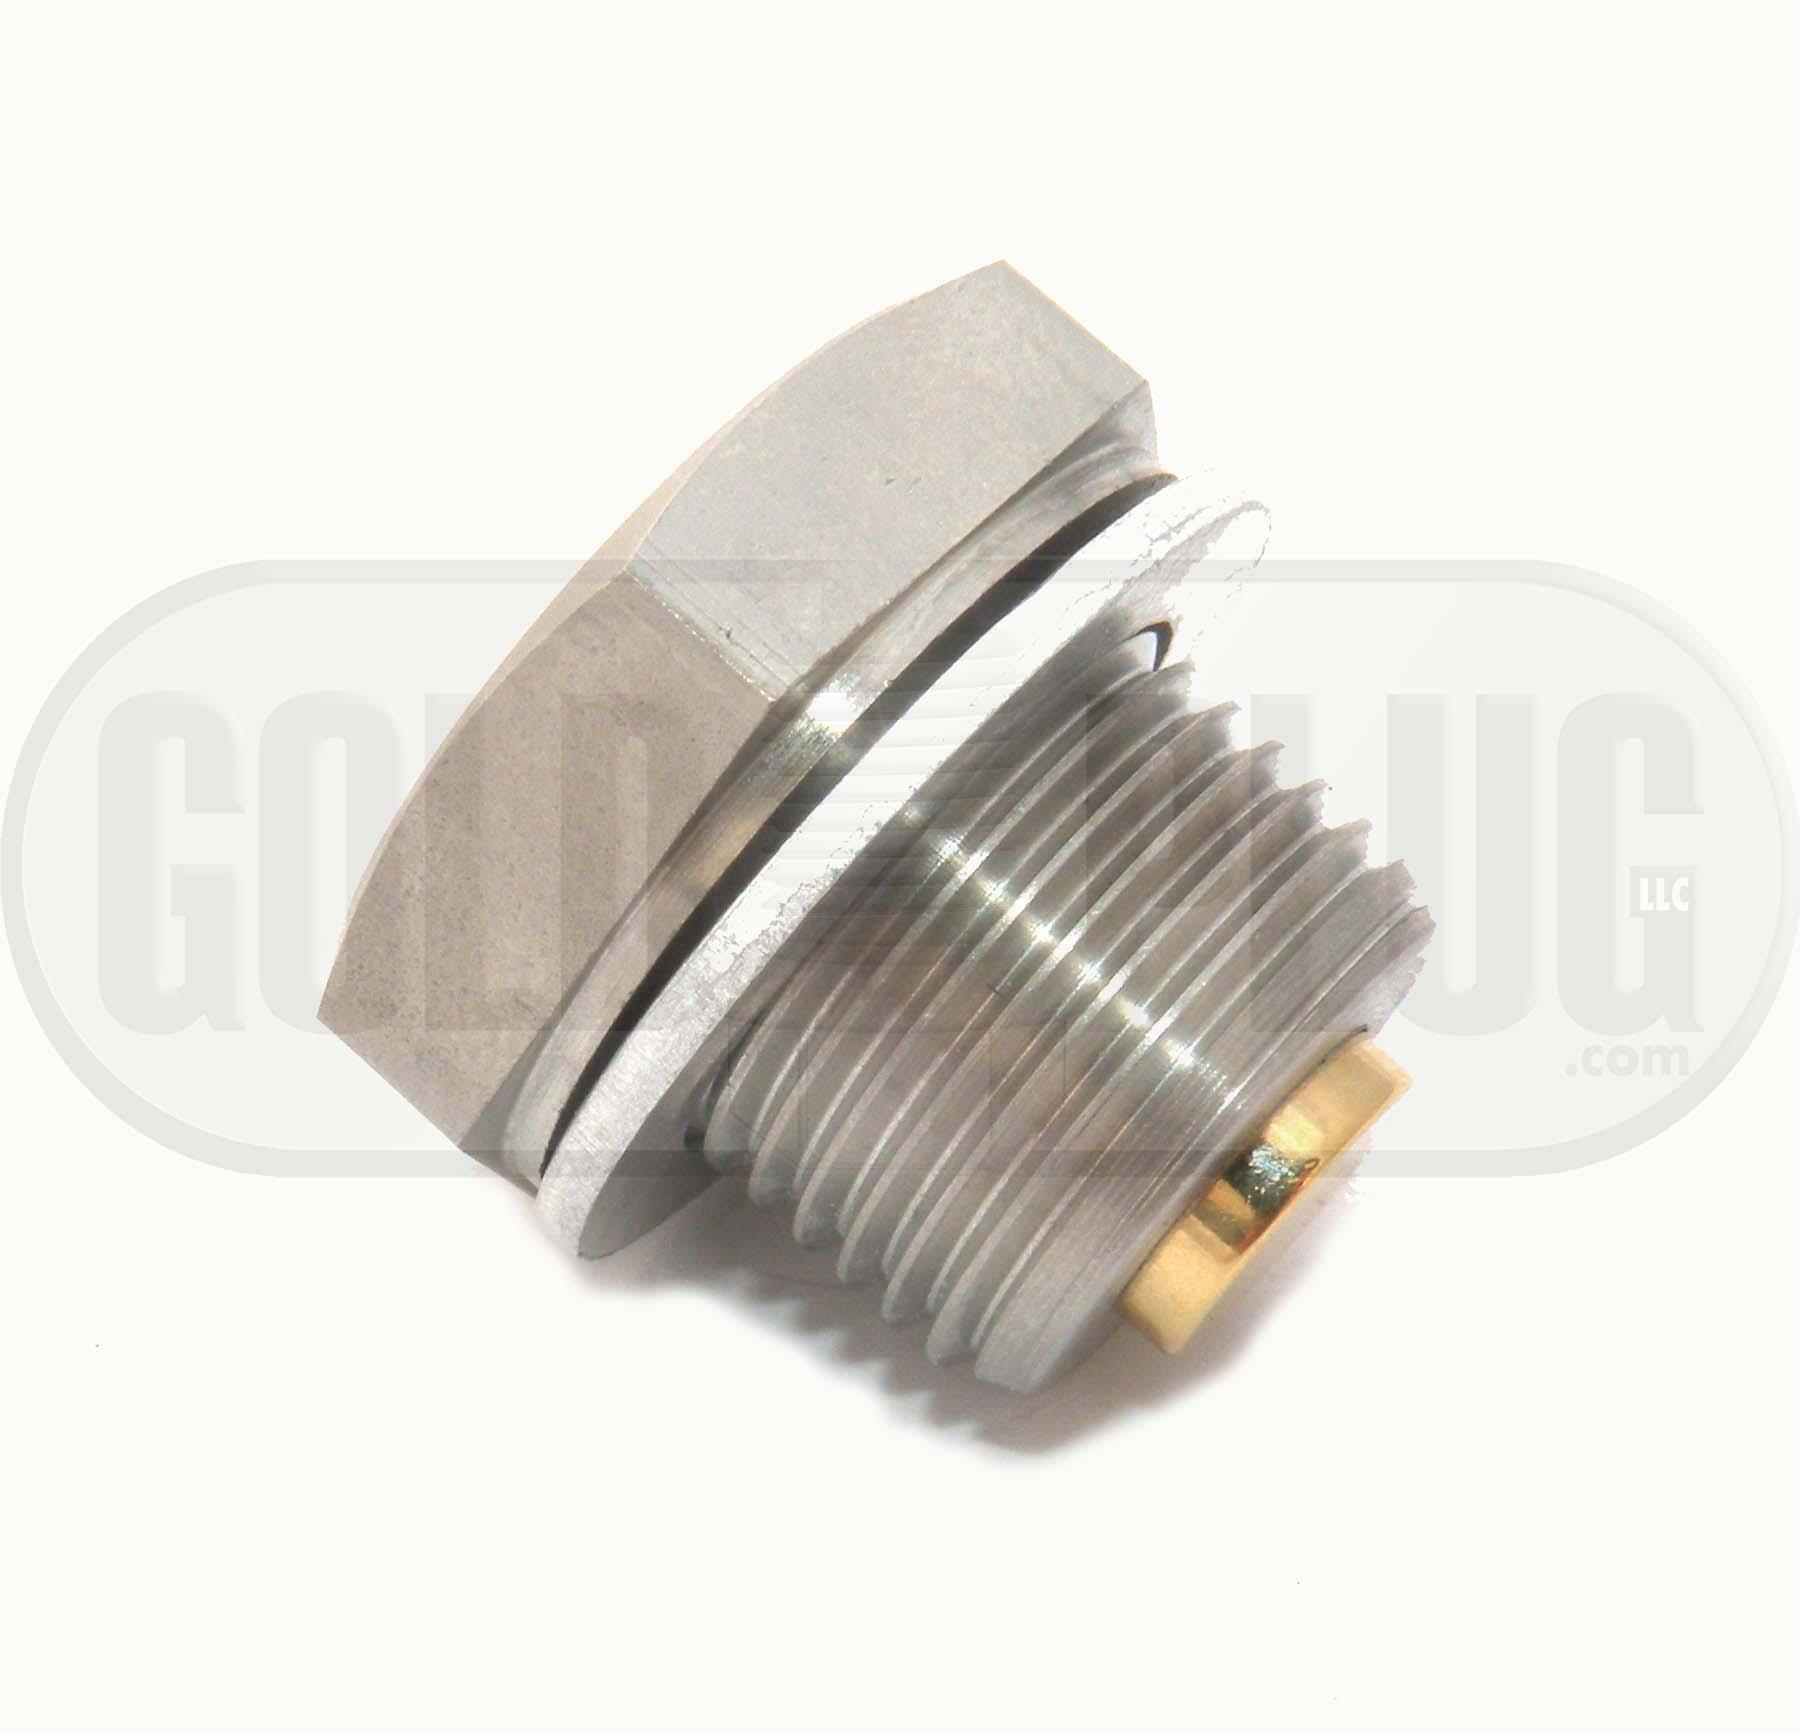 Automotive (Car/Truck/SUV/etc) Drain Plugs – Magnetic Drain Plugs